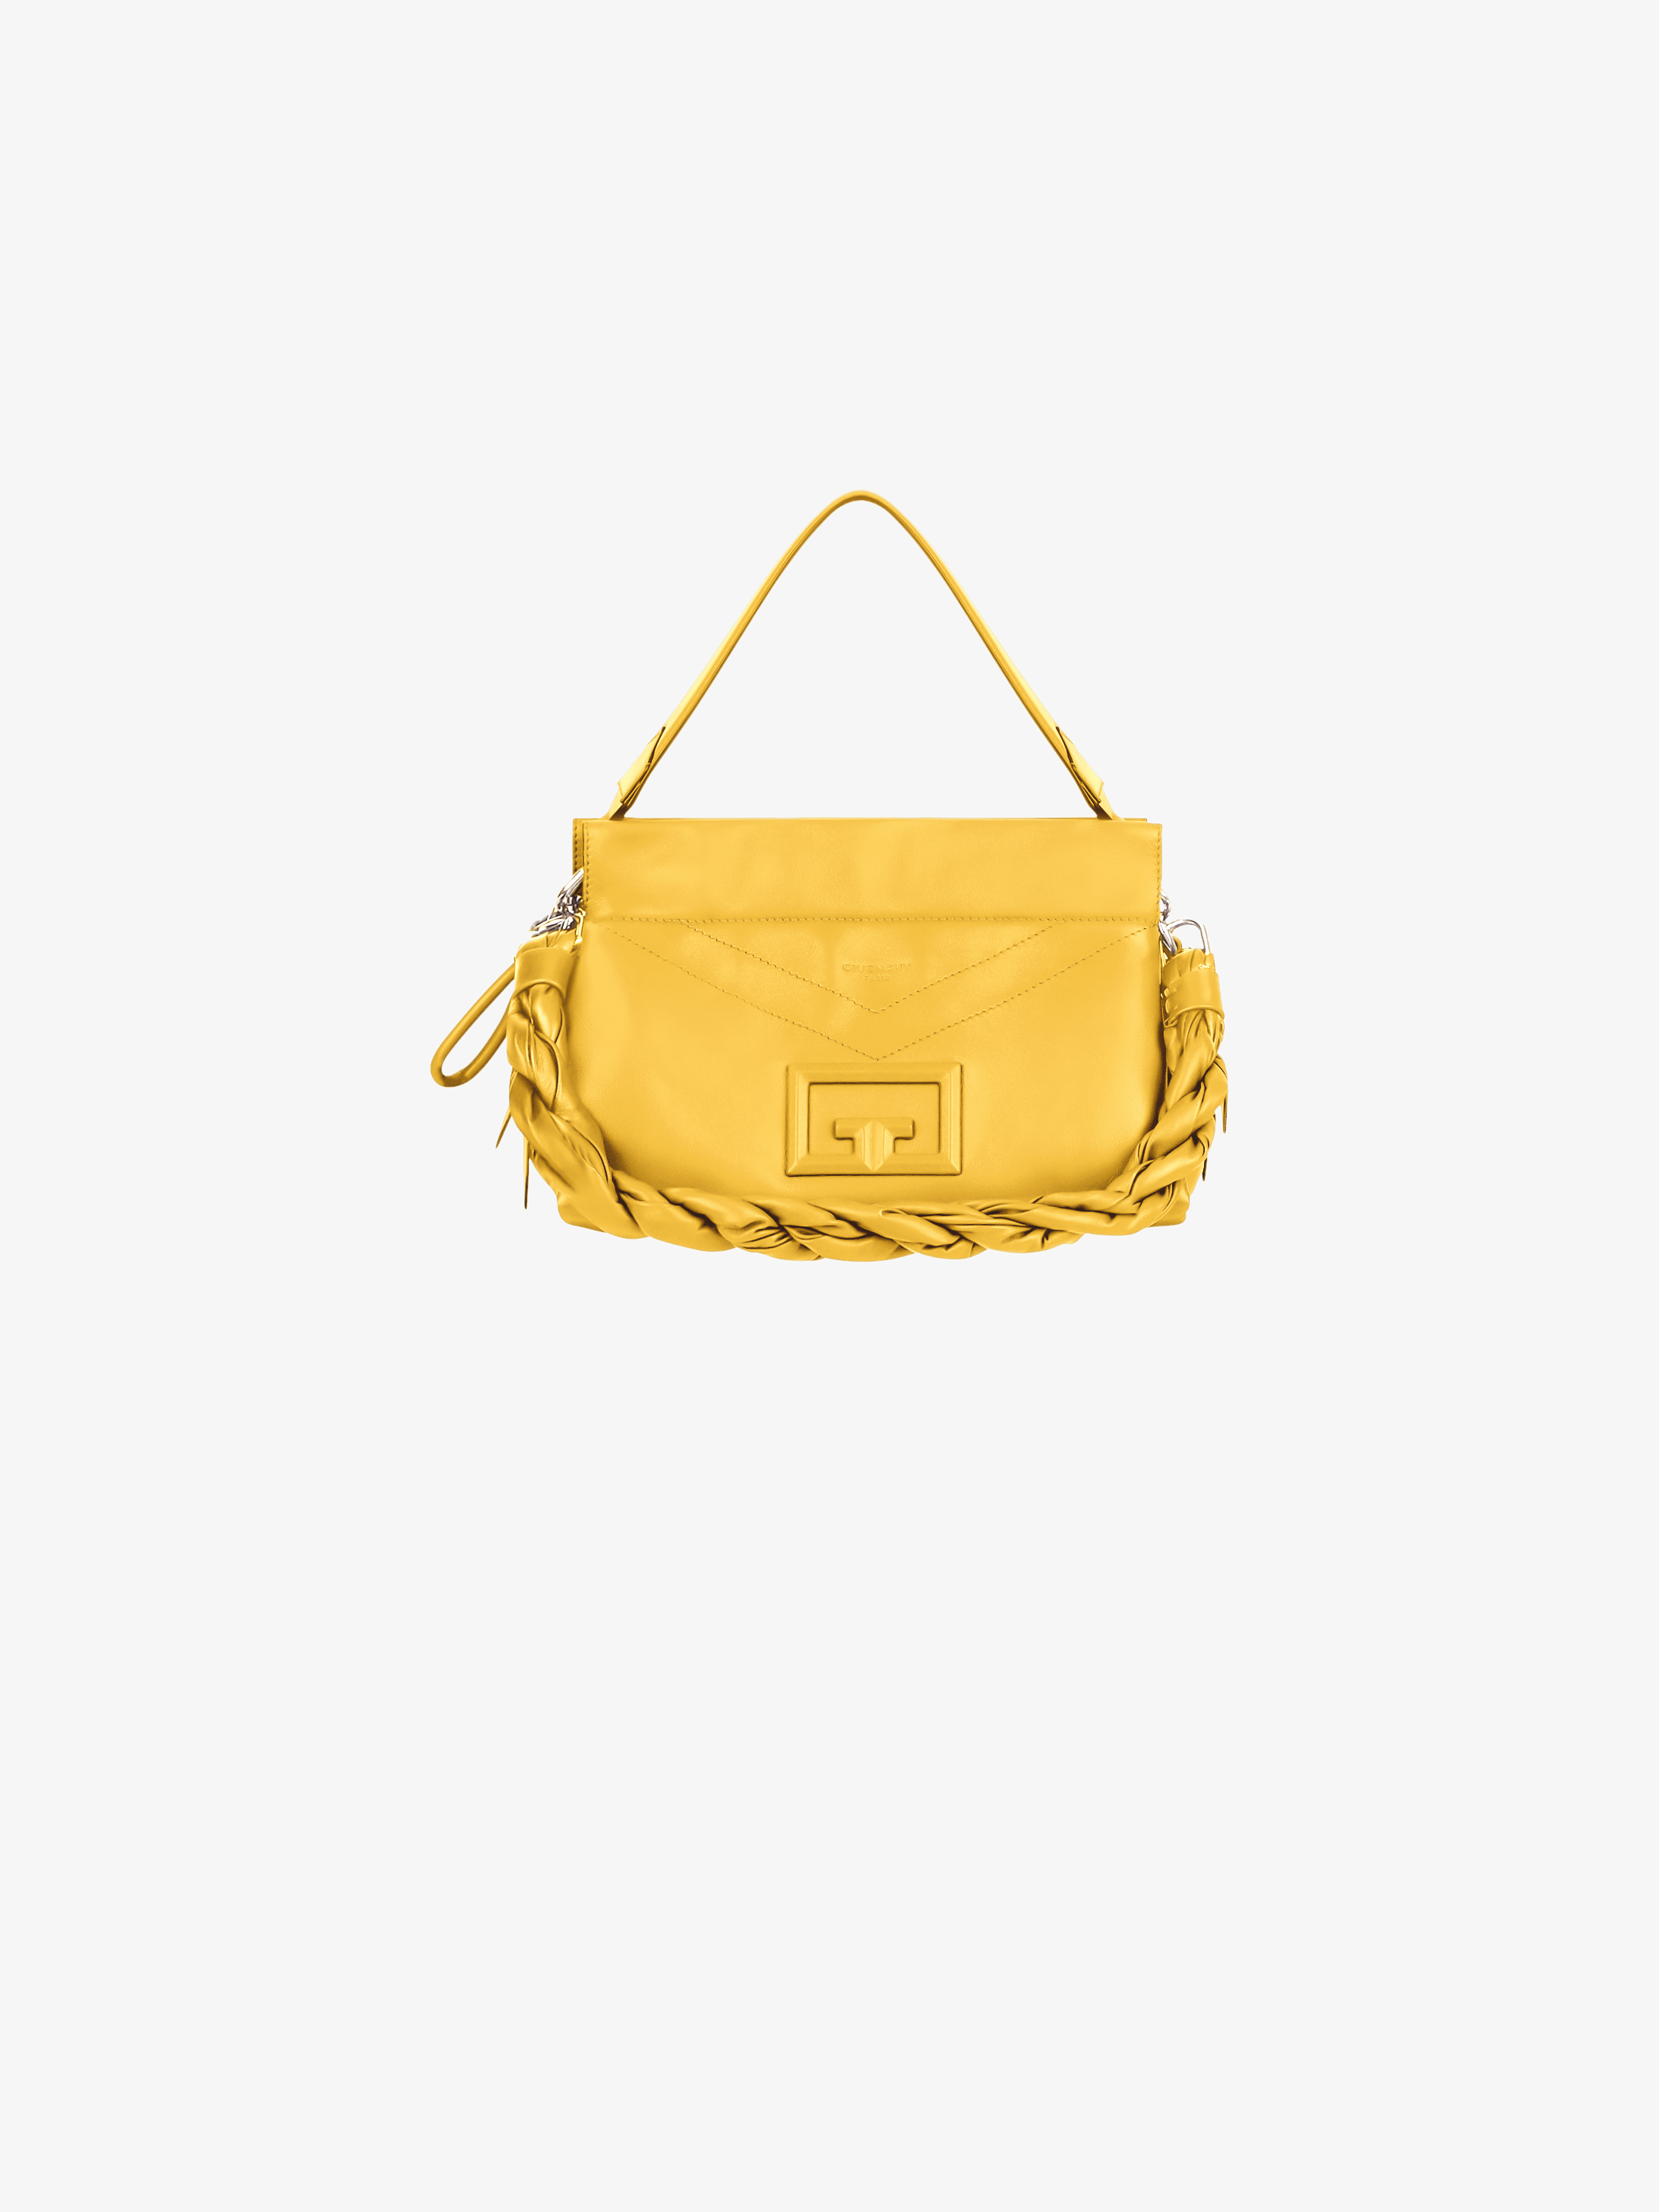 Medium ID93 bag in smooth leather